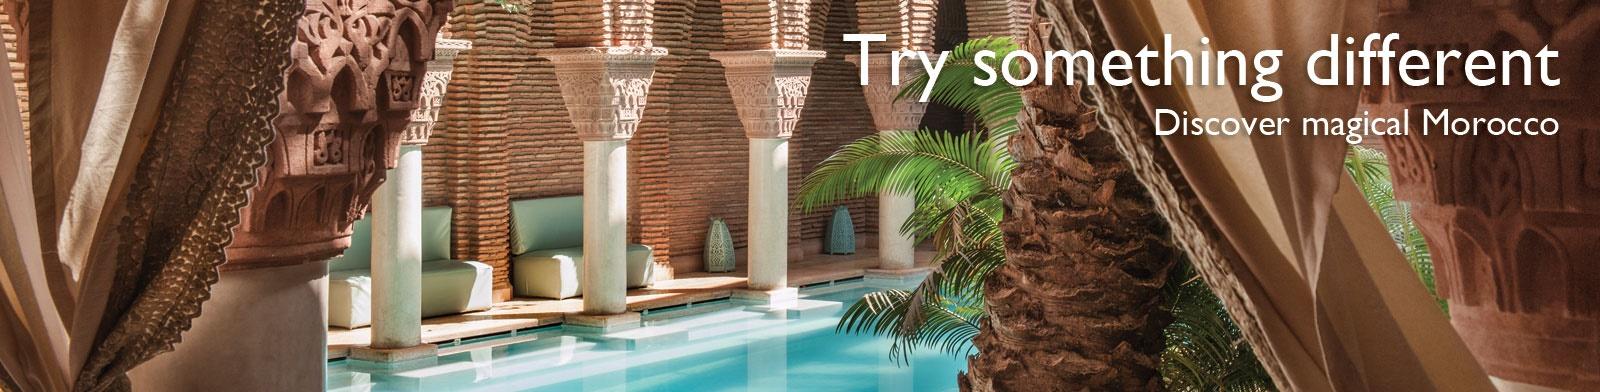 Morocco, Main Image